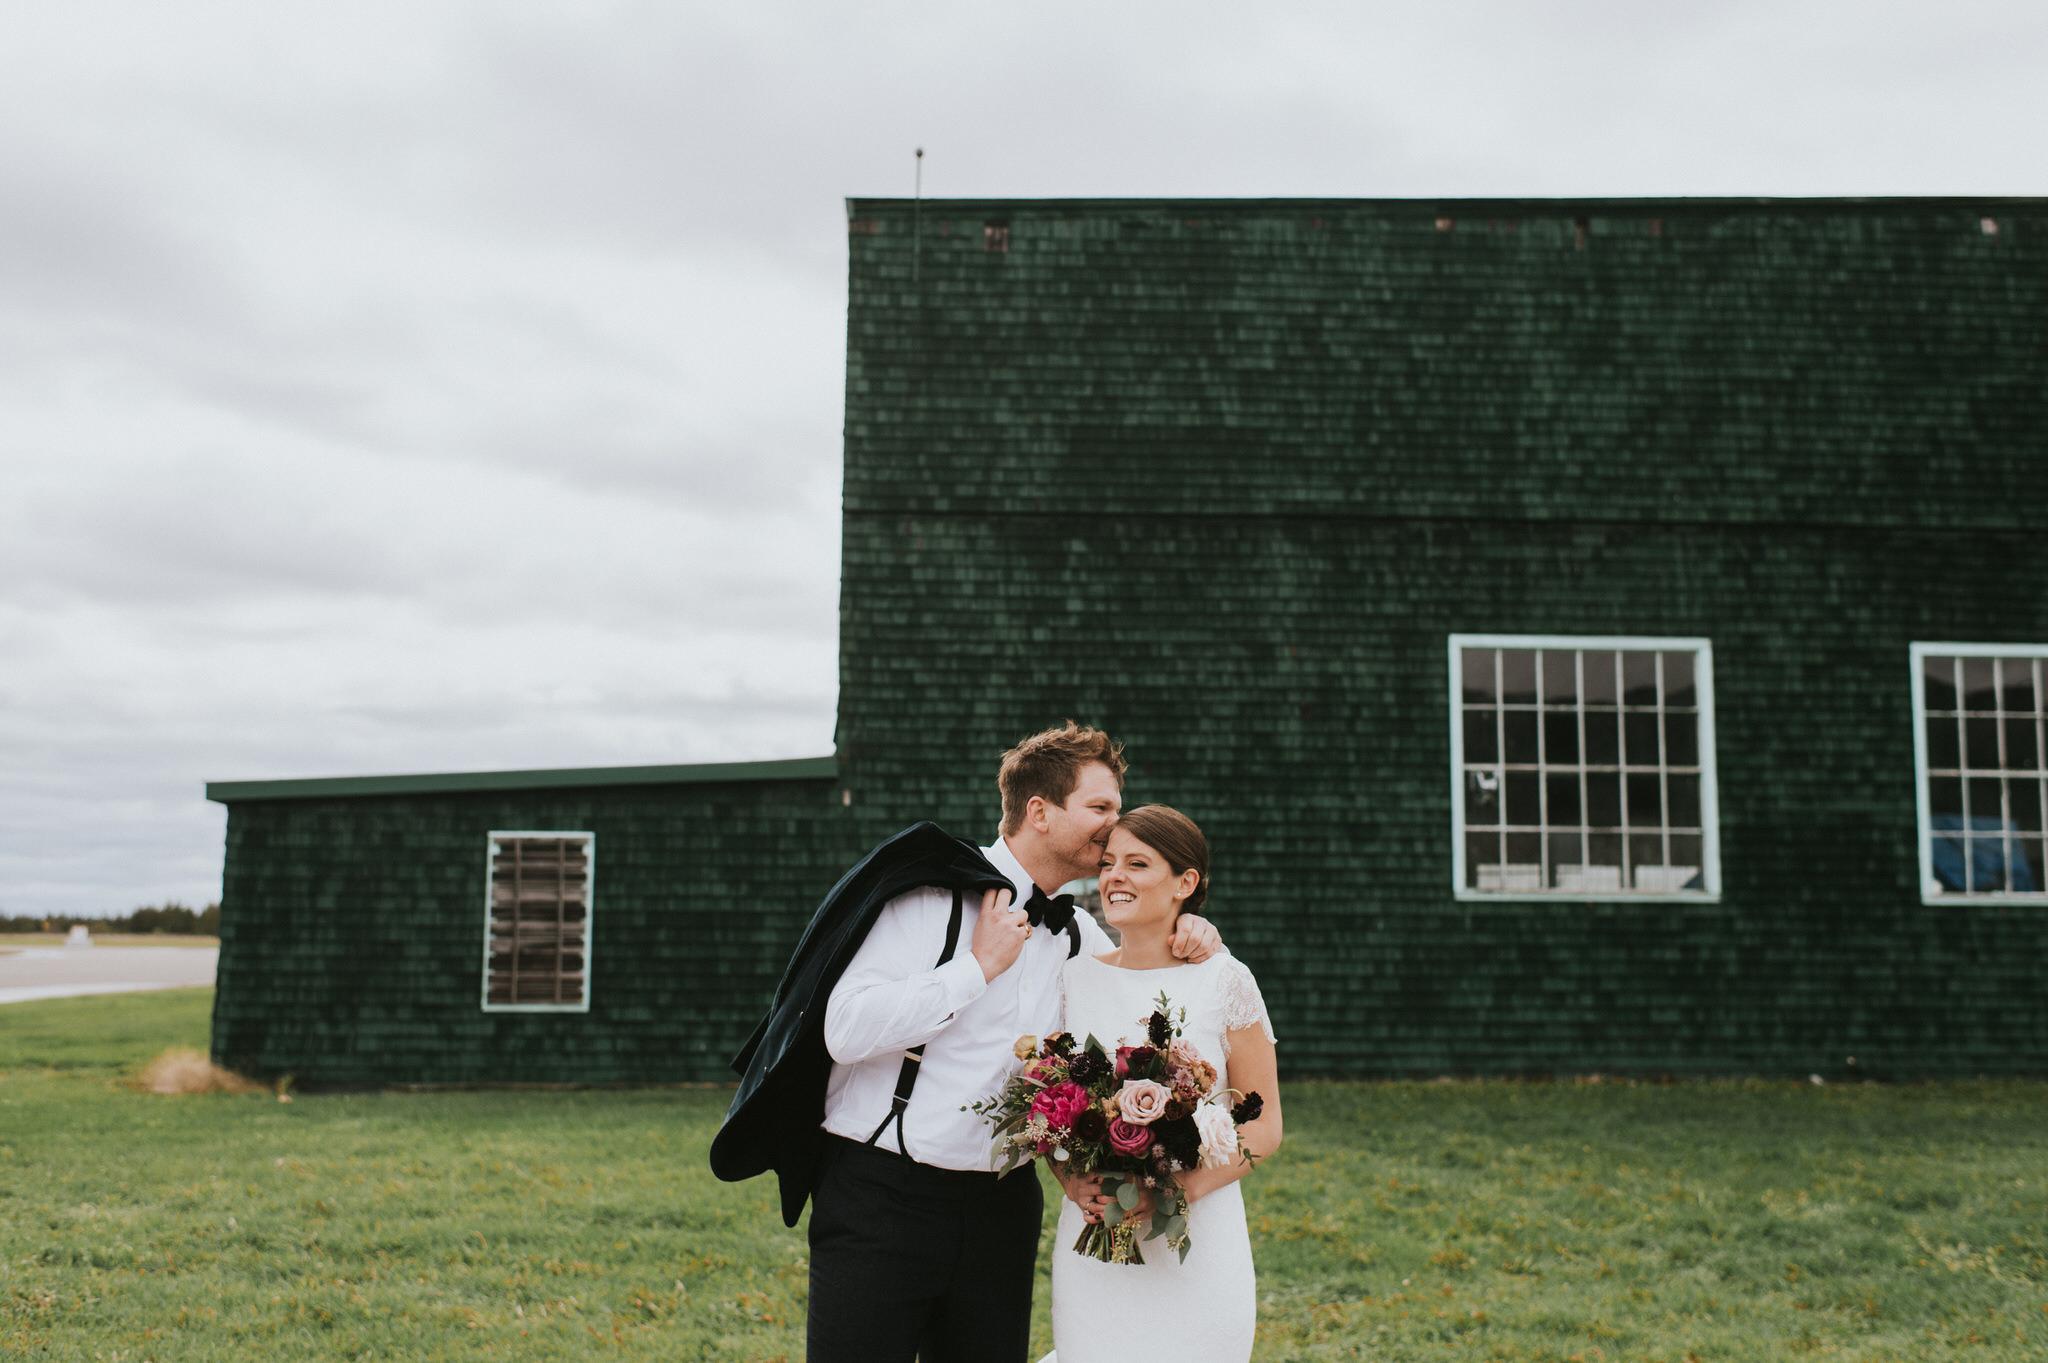 scarletoneillphotography_weddingphotography_prince edward county weddings068.JPG